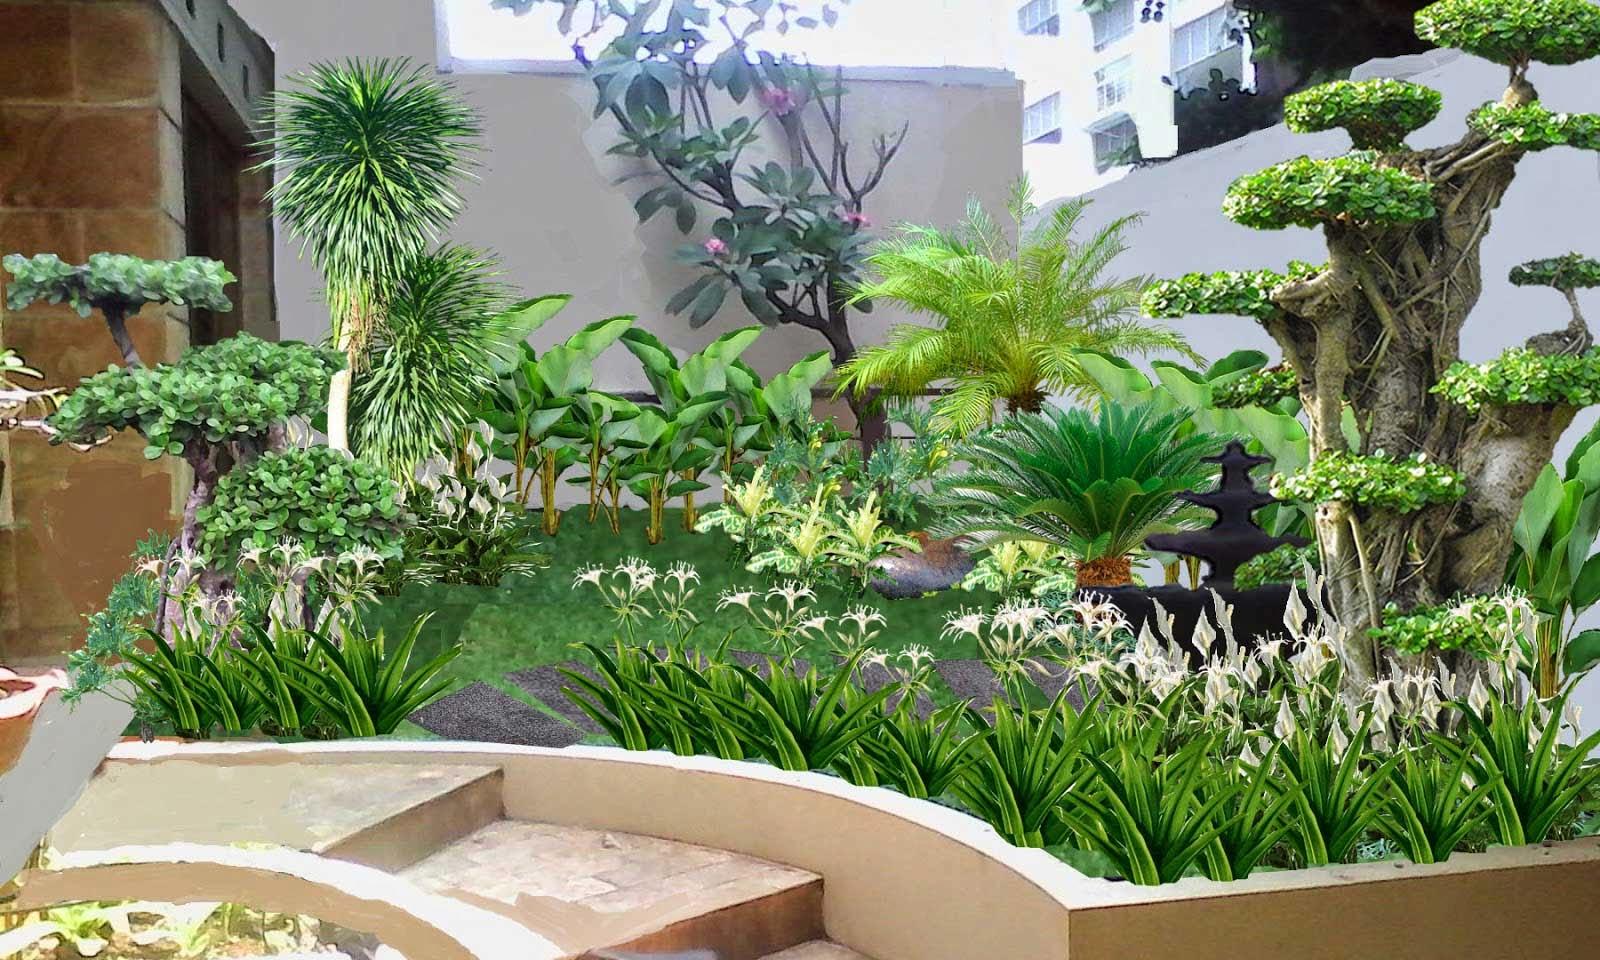 35 Inspirasi Gambar Bunga Hias Taman Bunga Hias